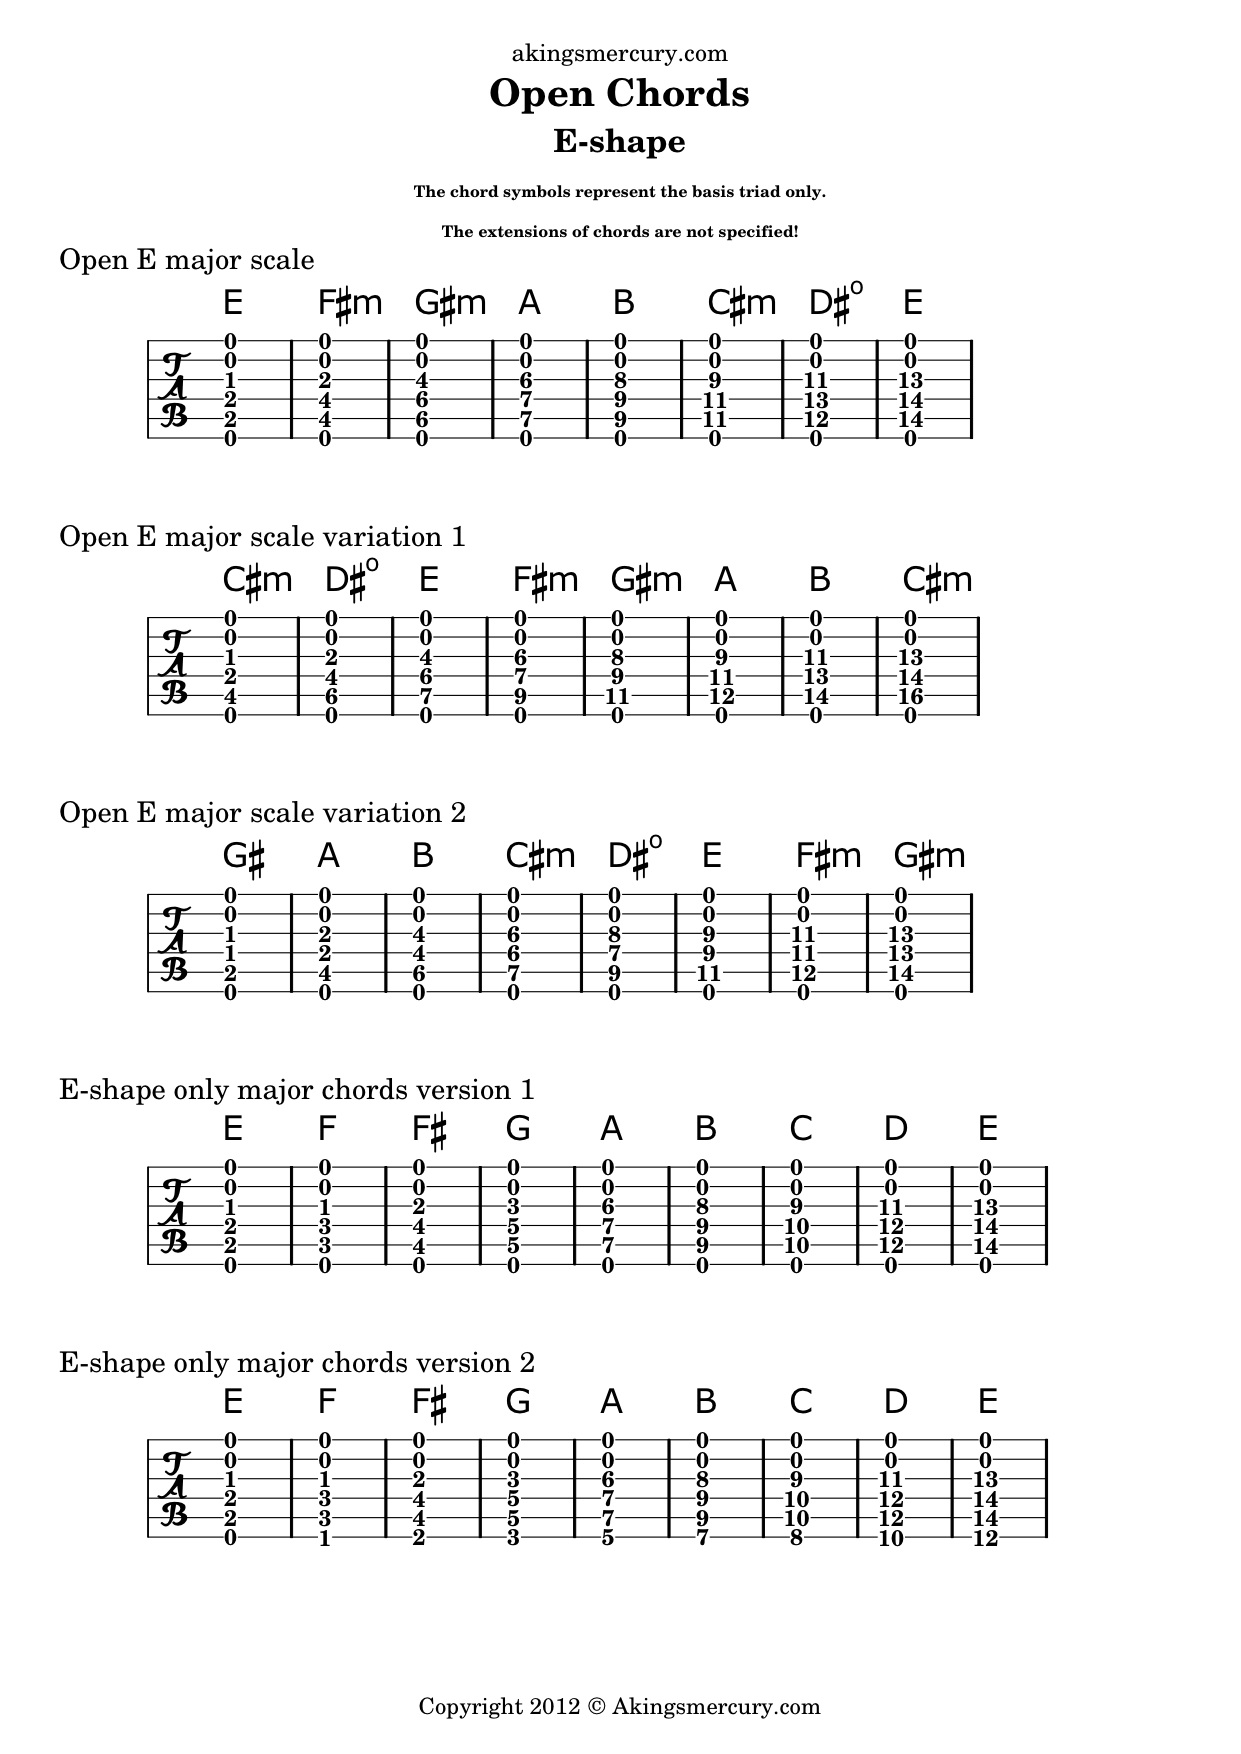 Open E Chord Diagrams Block And Schematic Diagrams